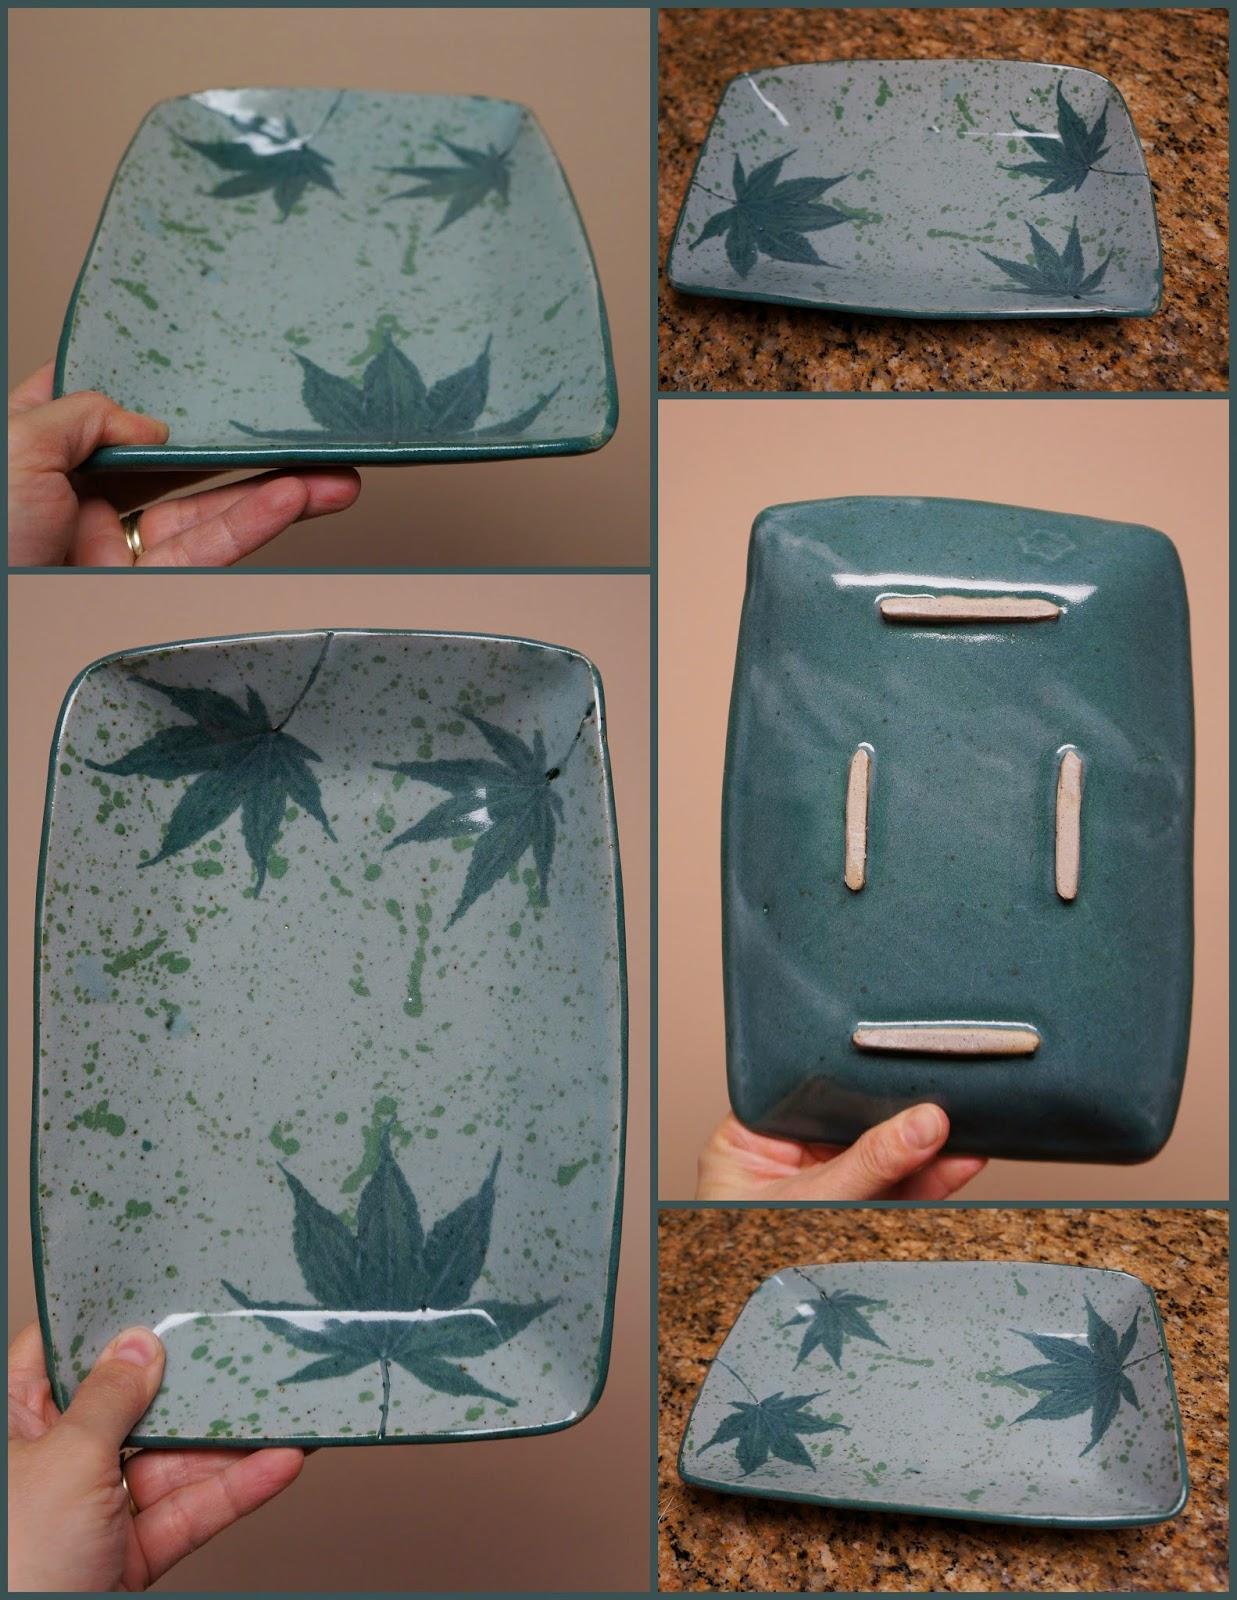 Handmade ceramic stoneware pottery dish with pressed maple leaf design.